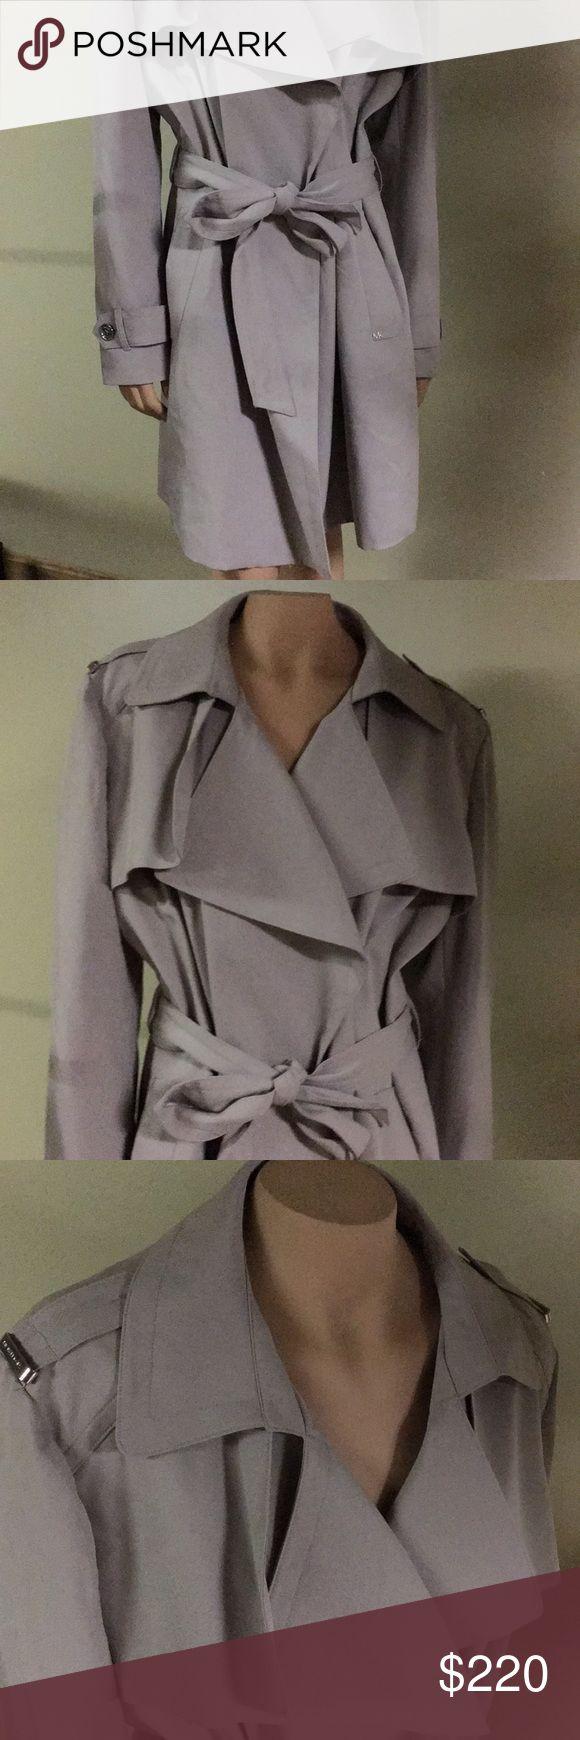 NWT// Michael Khors Khaki Trench NWT// Michael Khors Khaki Trench MICHAEL Michael Kors Jackets & Coats Trench Coats